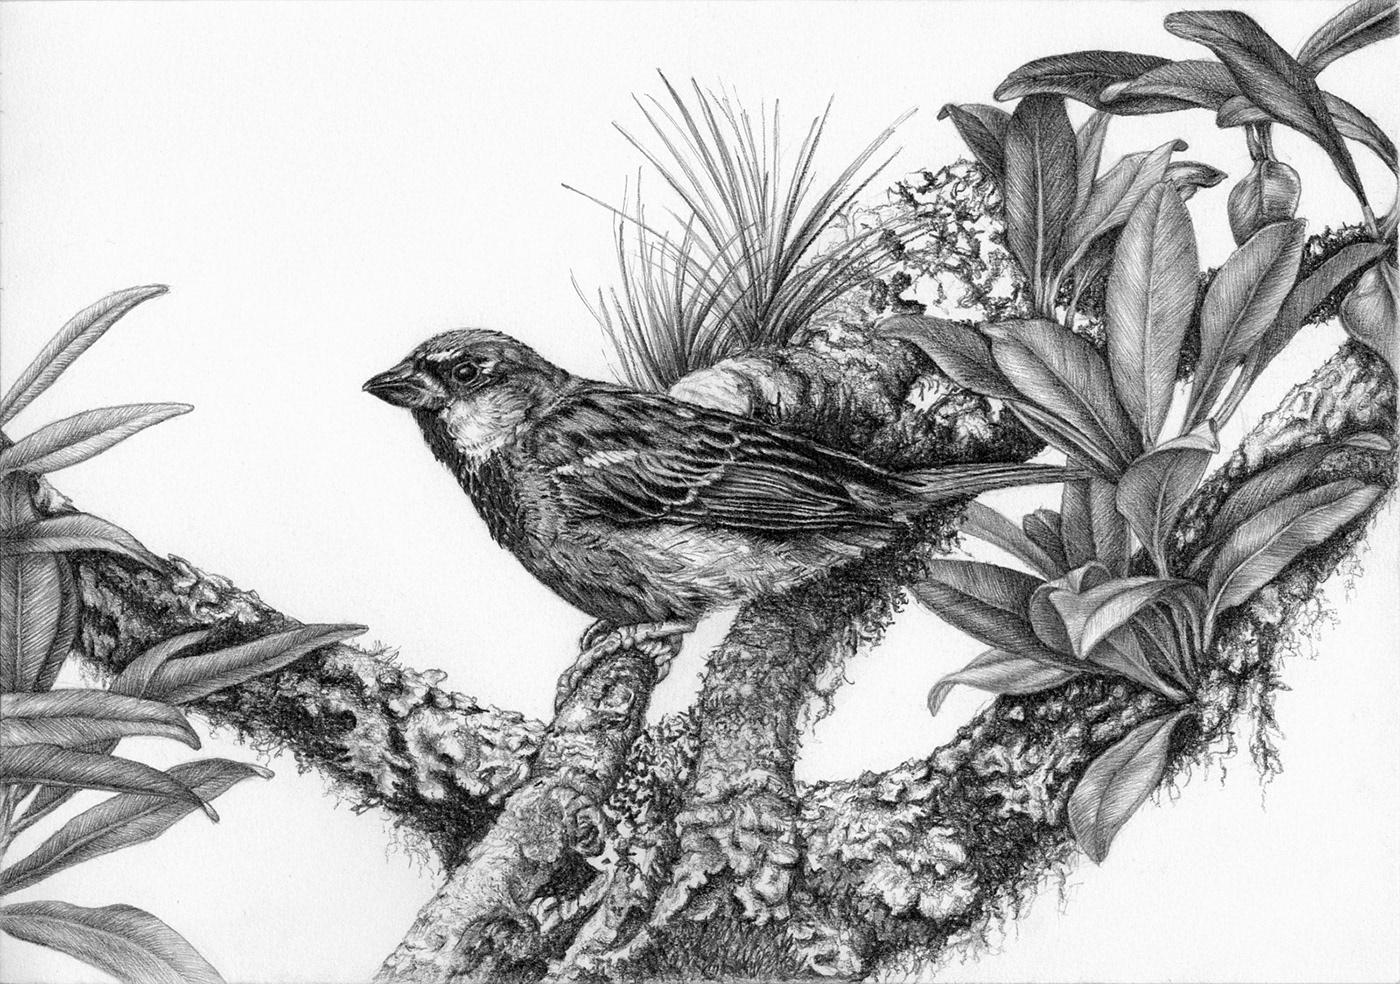 Birds - pencil drawings 4 on Behance